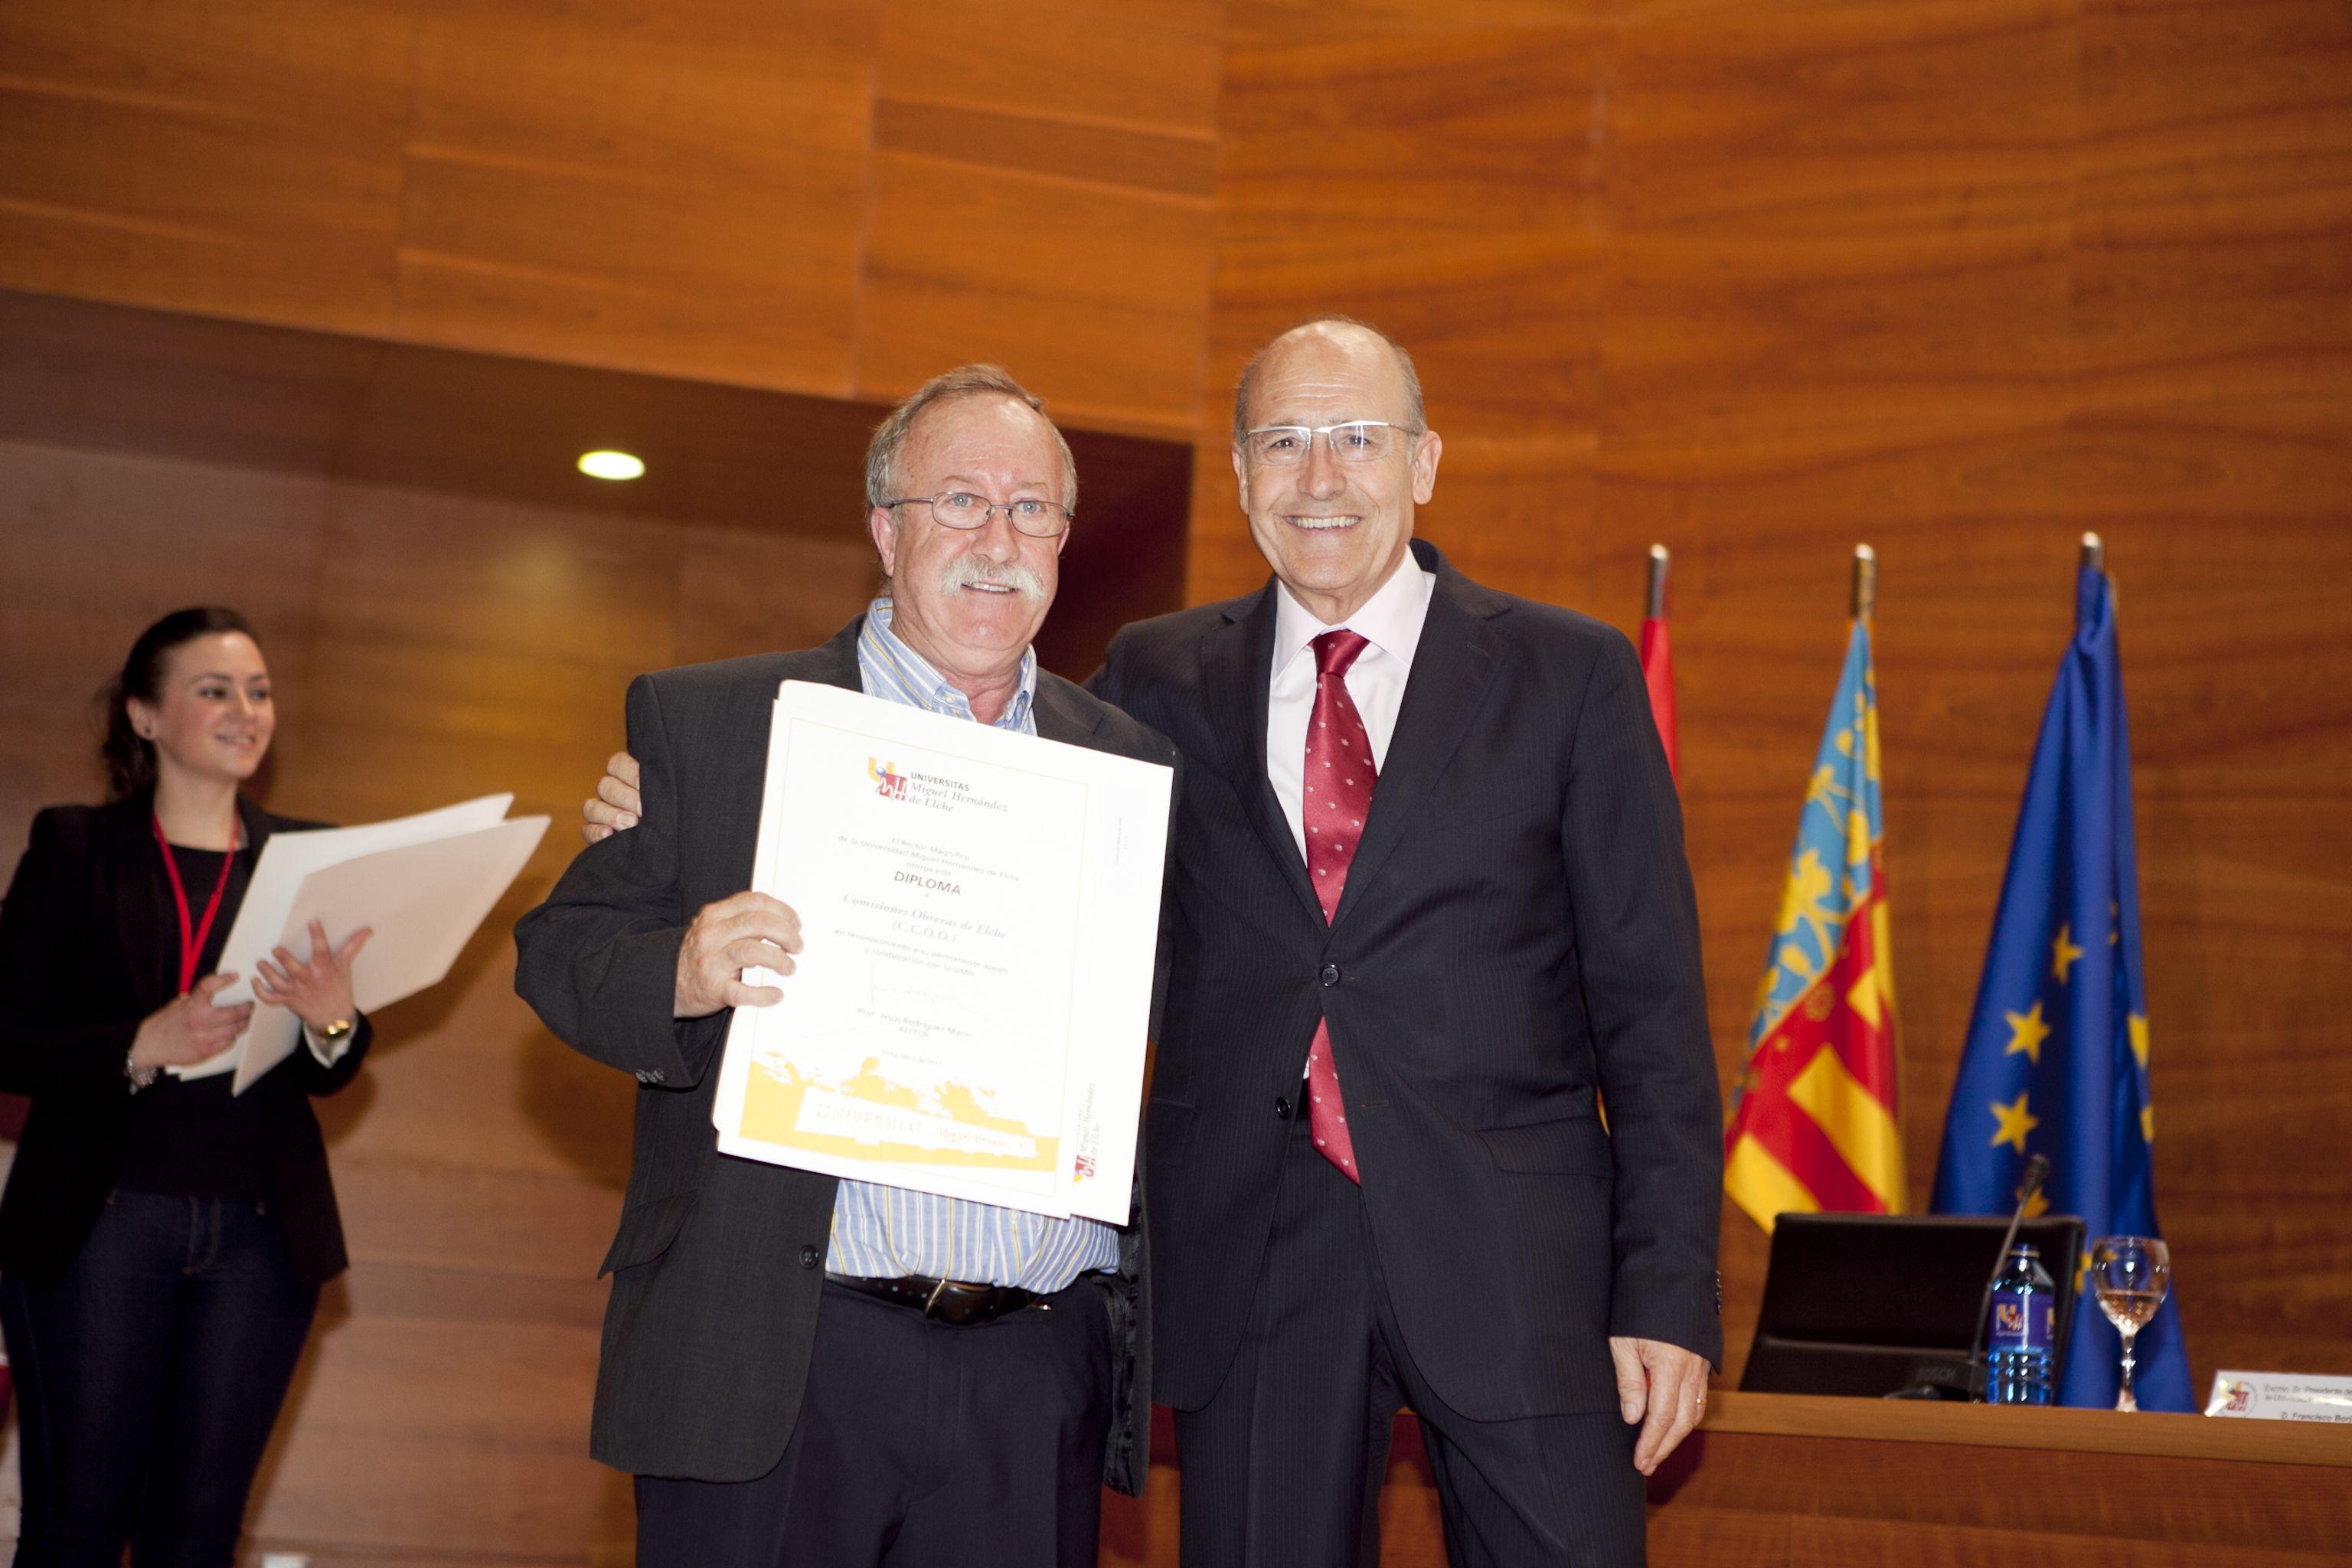 umh-diplomas-rector_mg_6934.jpg